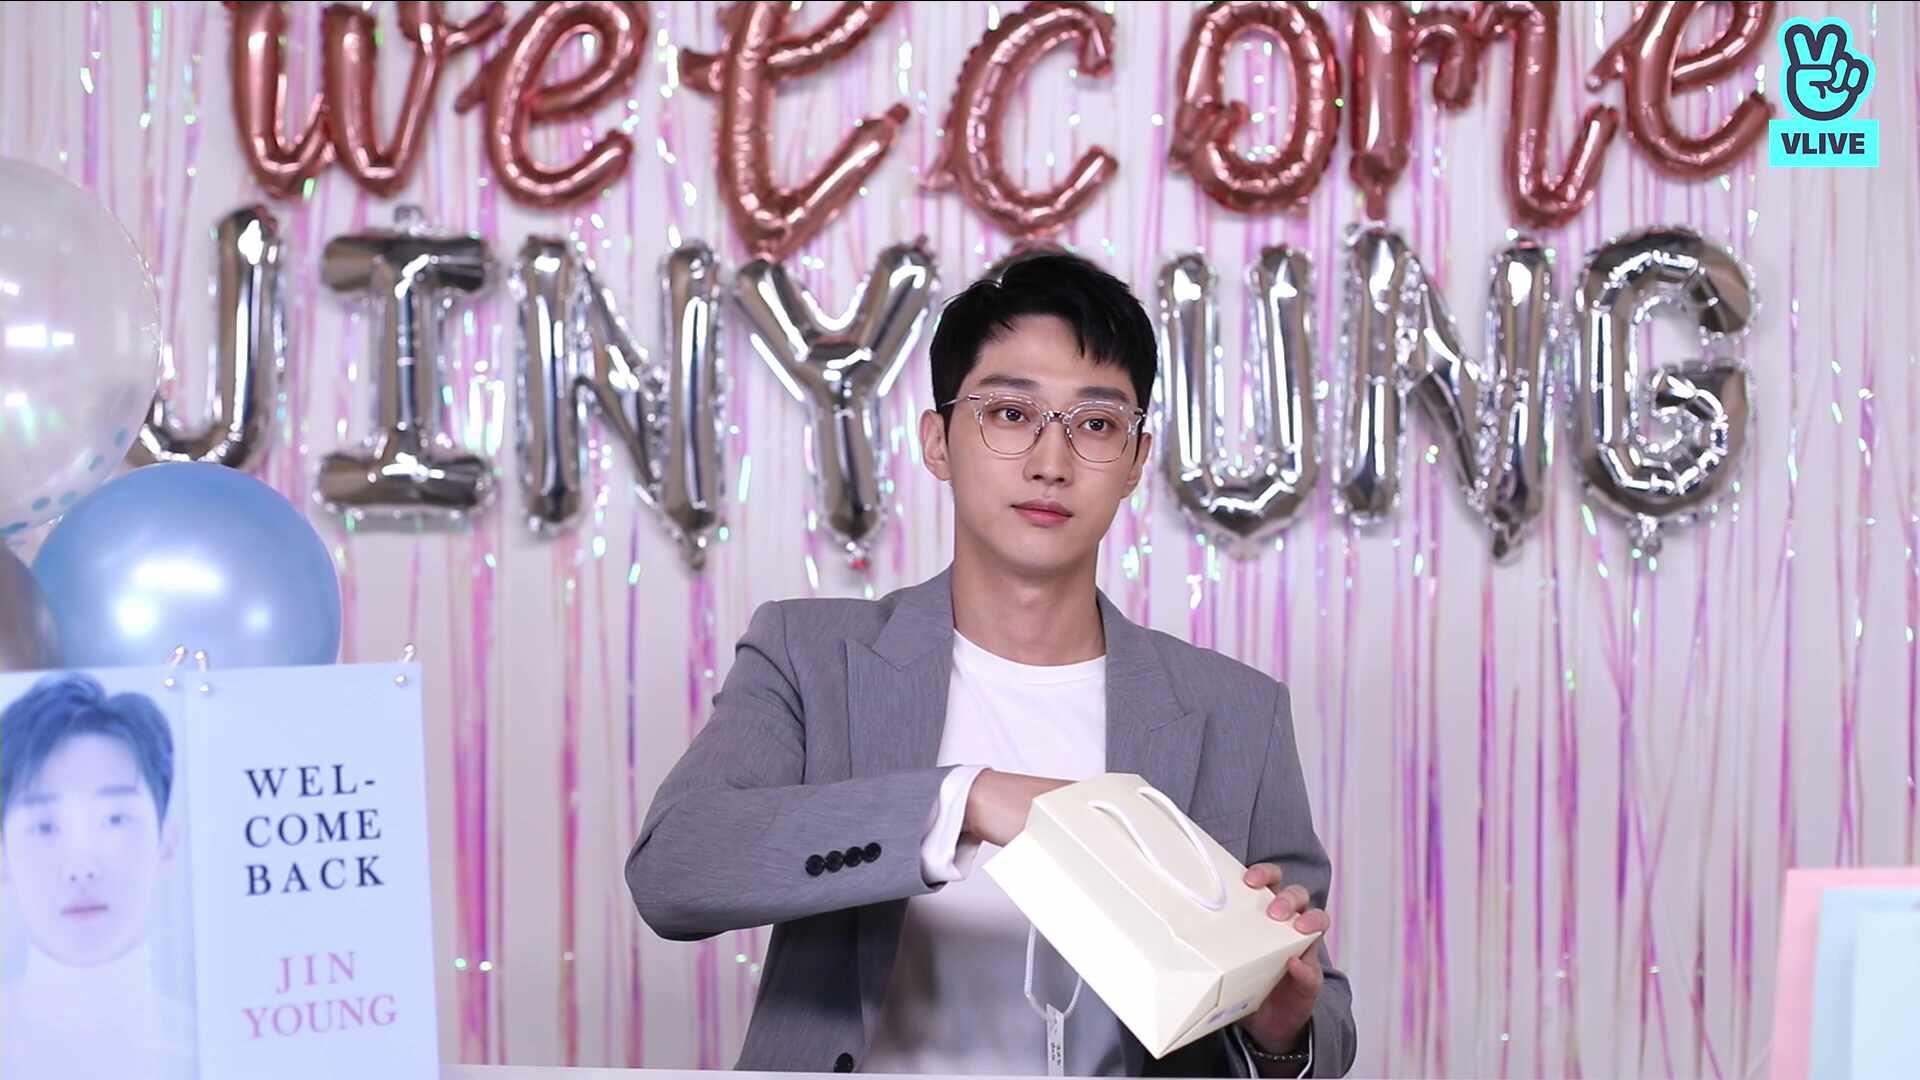 WELCOME BACK JINYOUNG